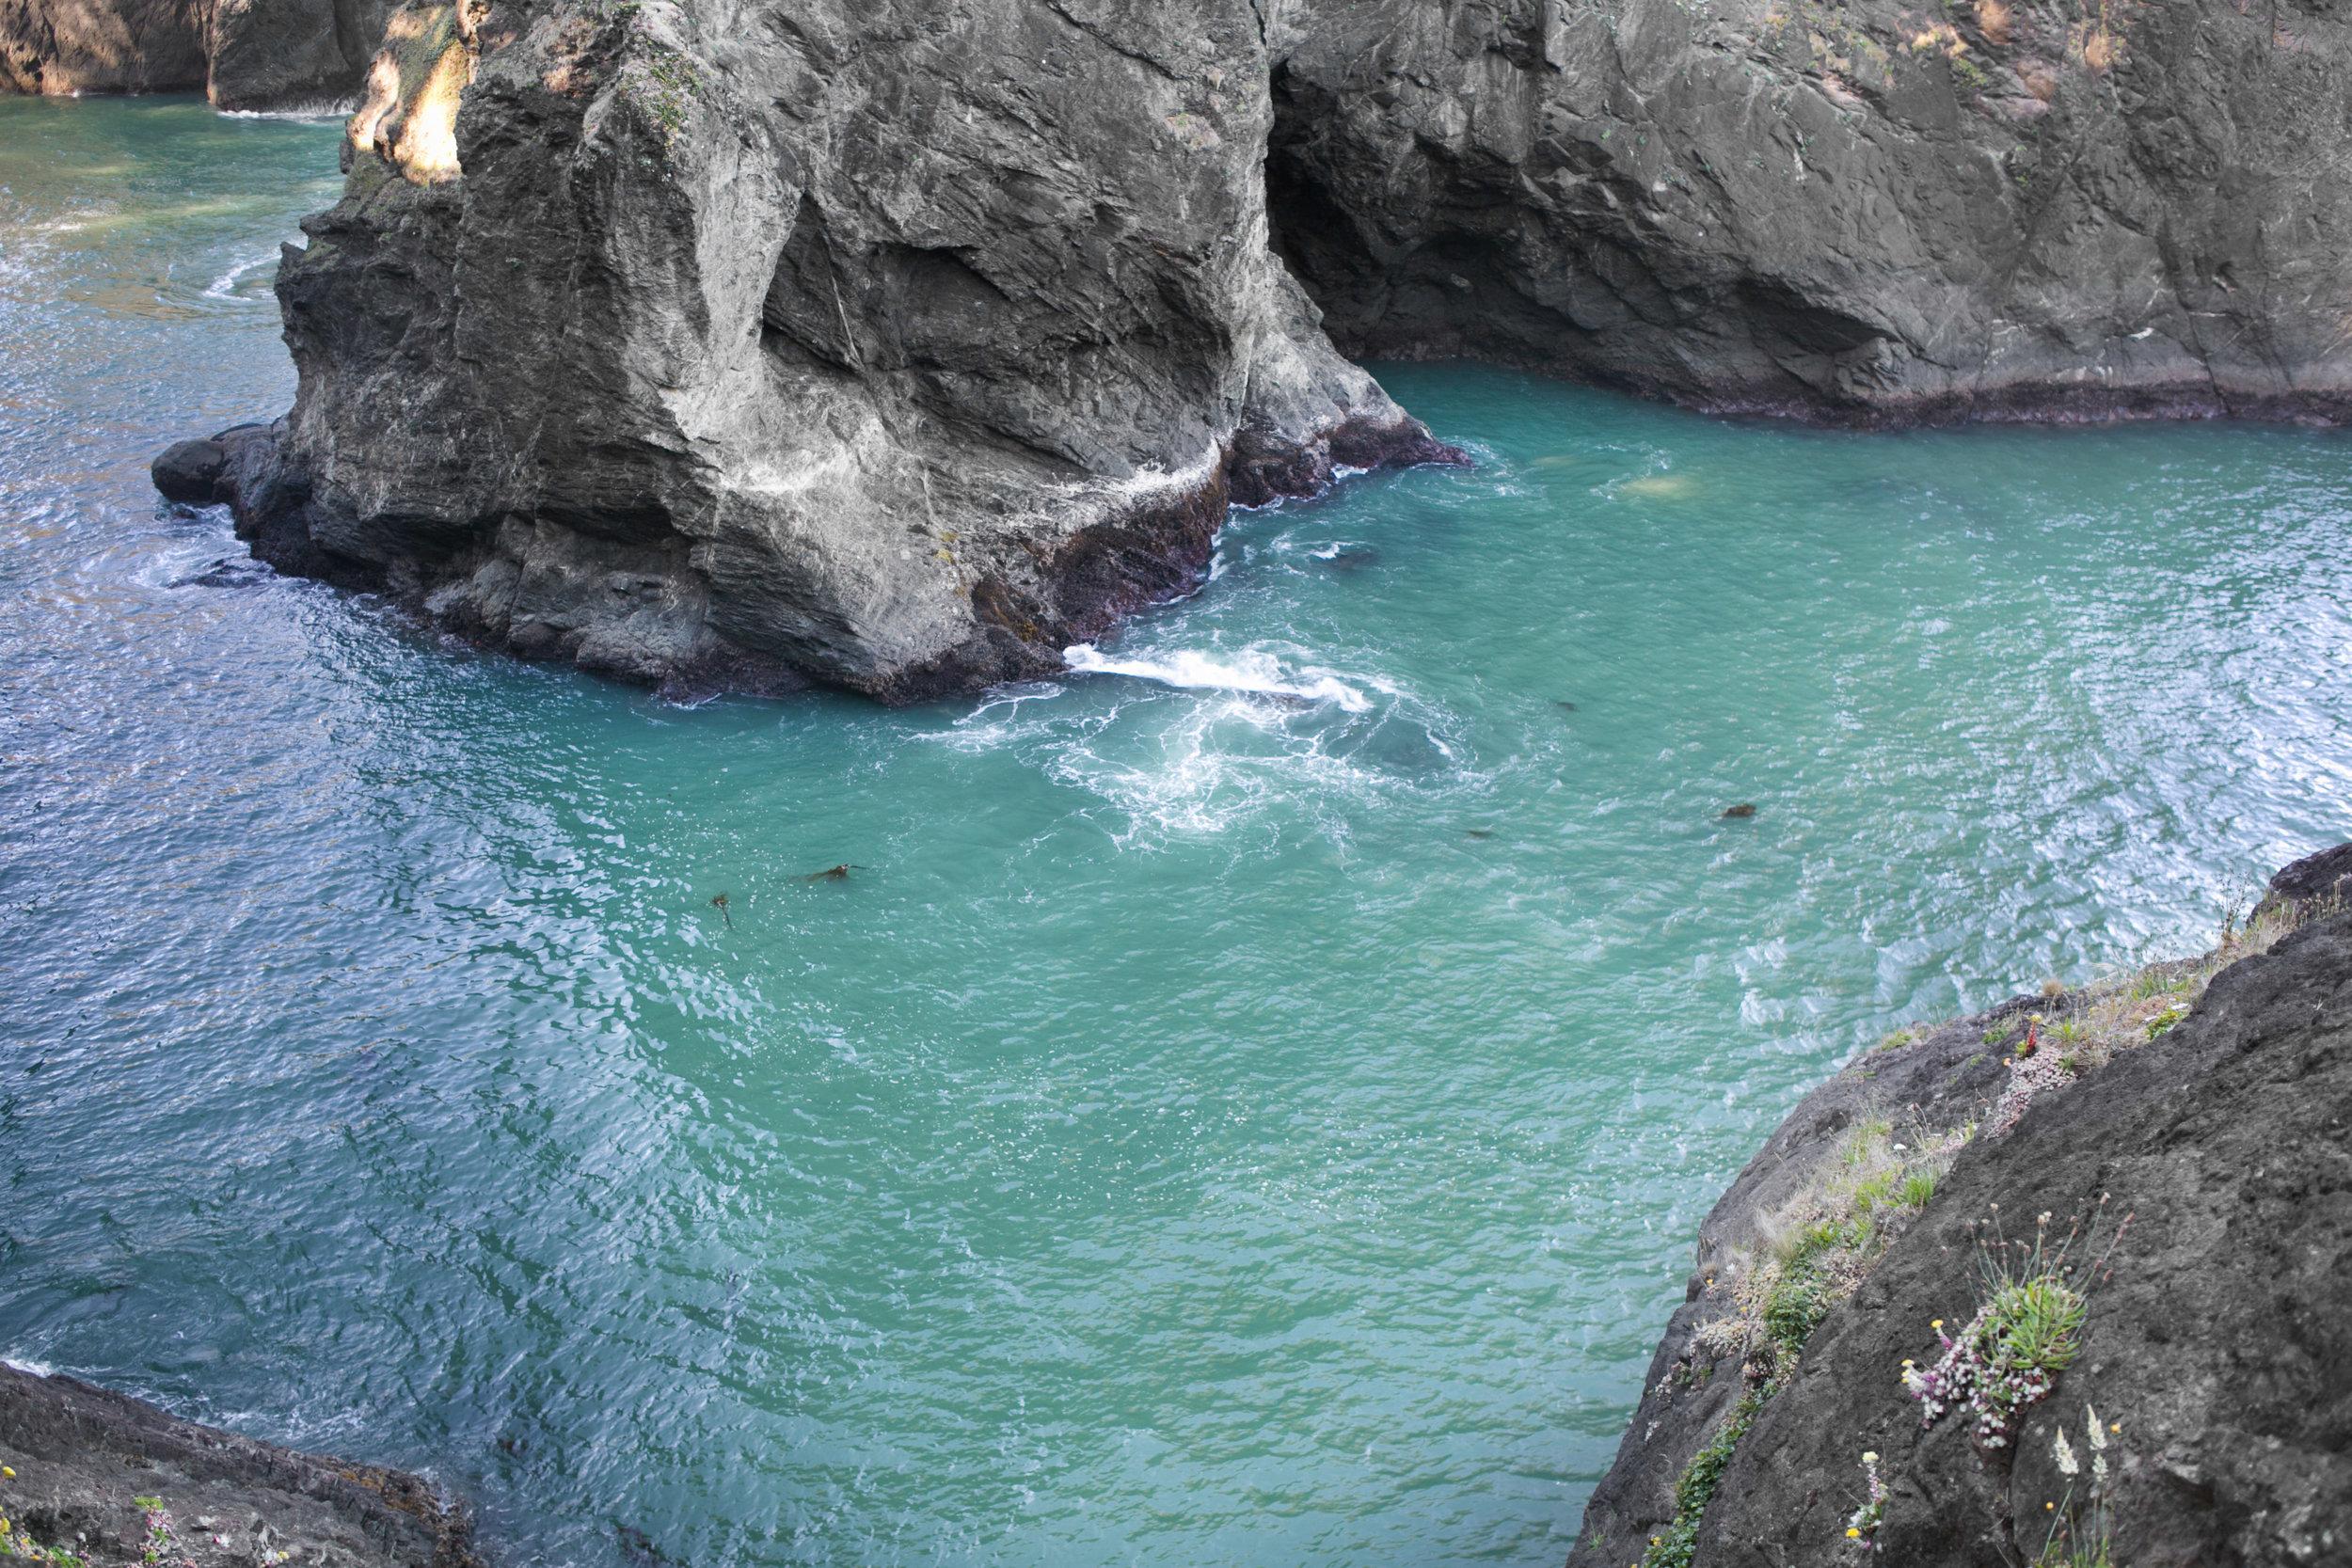 096Travel_Adventure_Outdoor_Photography_Outlive_Creative_Oregon_Coast_Samuel H Boardman State Park.jpg